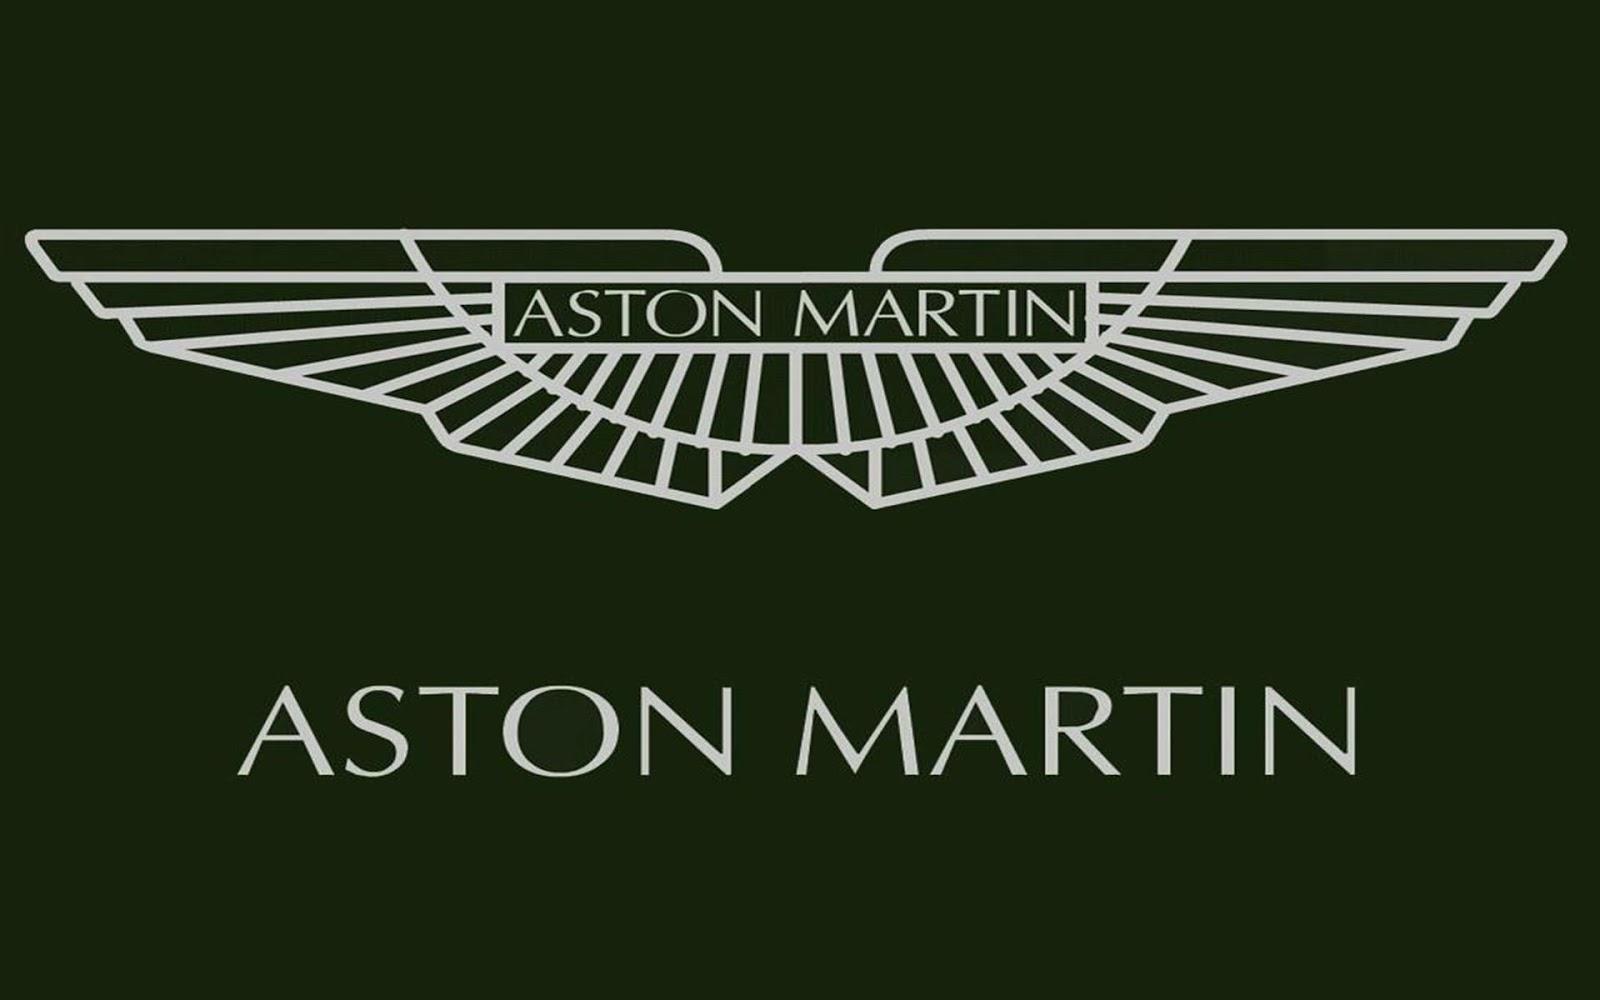 aston martin logo aston martin autoblog. Black Bedroom Furniture Sets. Home Design Ideas